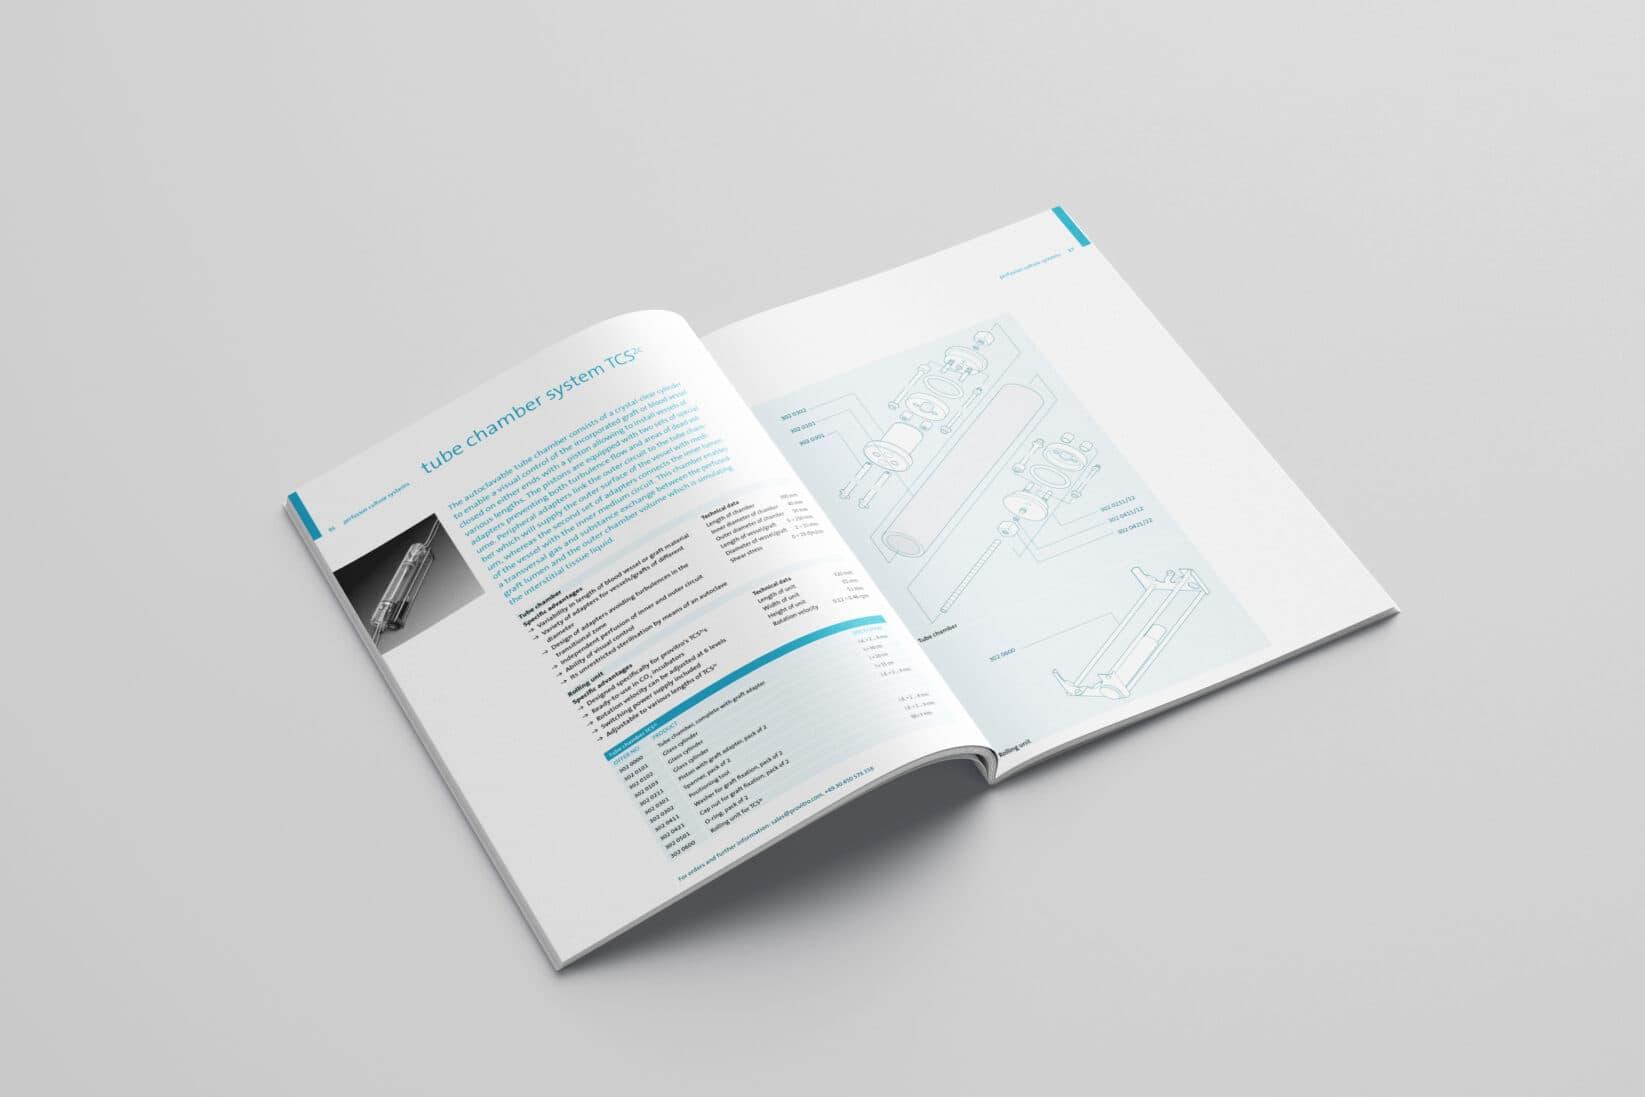 provitro Corporate Design Katalog Innenseite Grafik